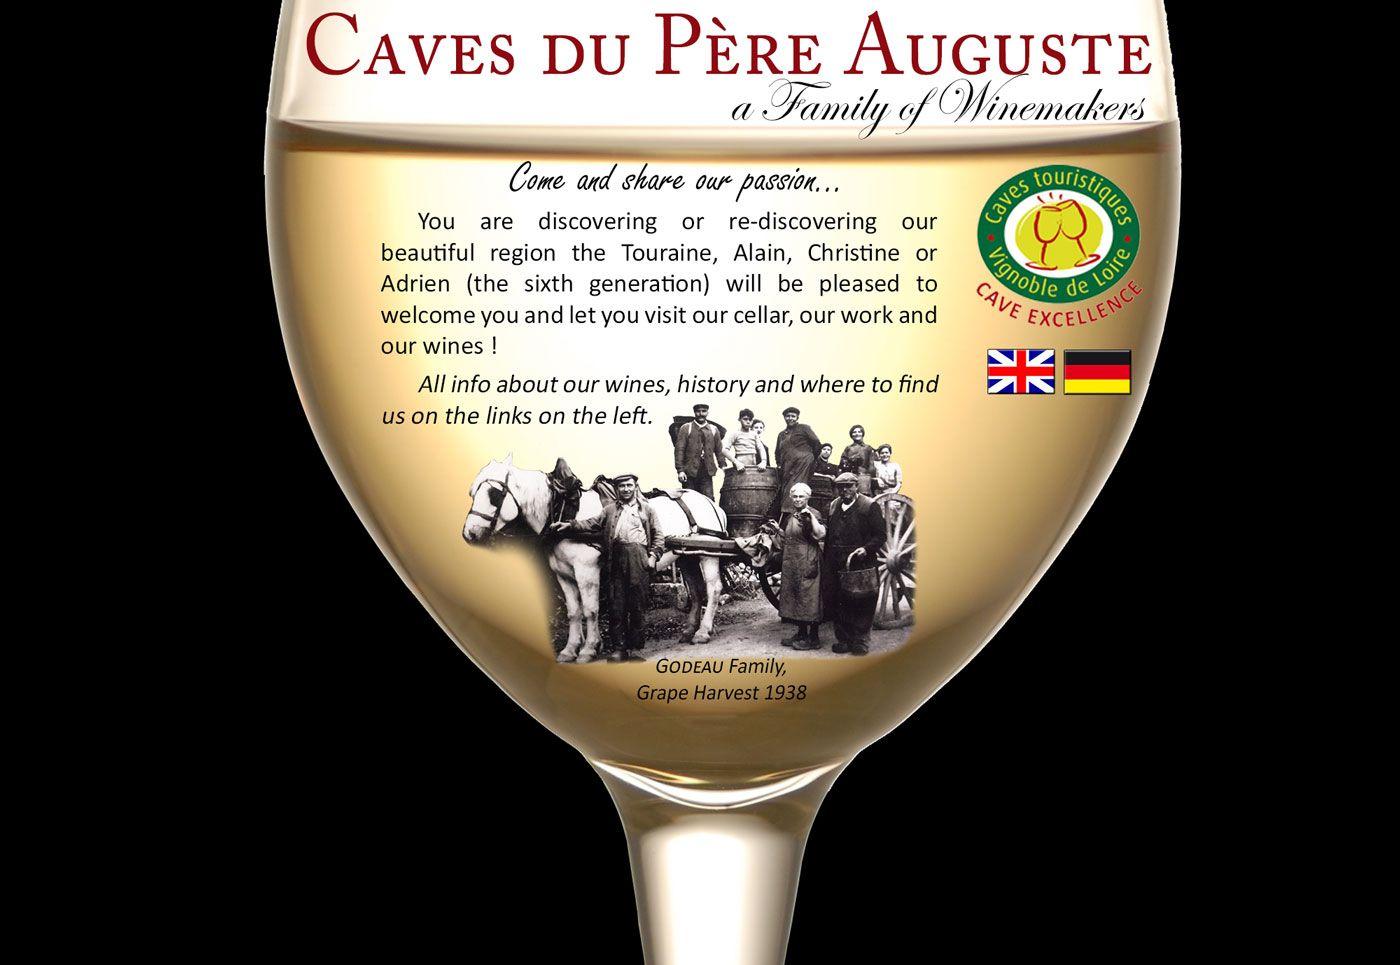 Les Caves du Père Auguste, a family of winemakers Caves